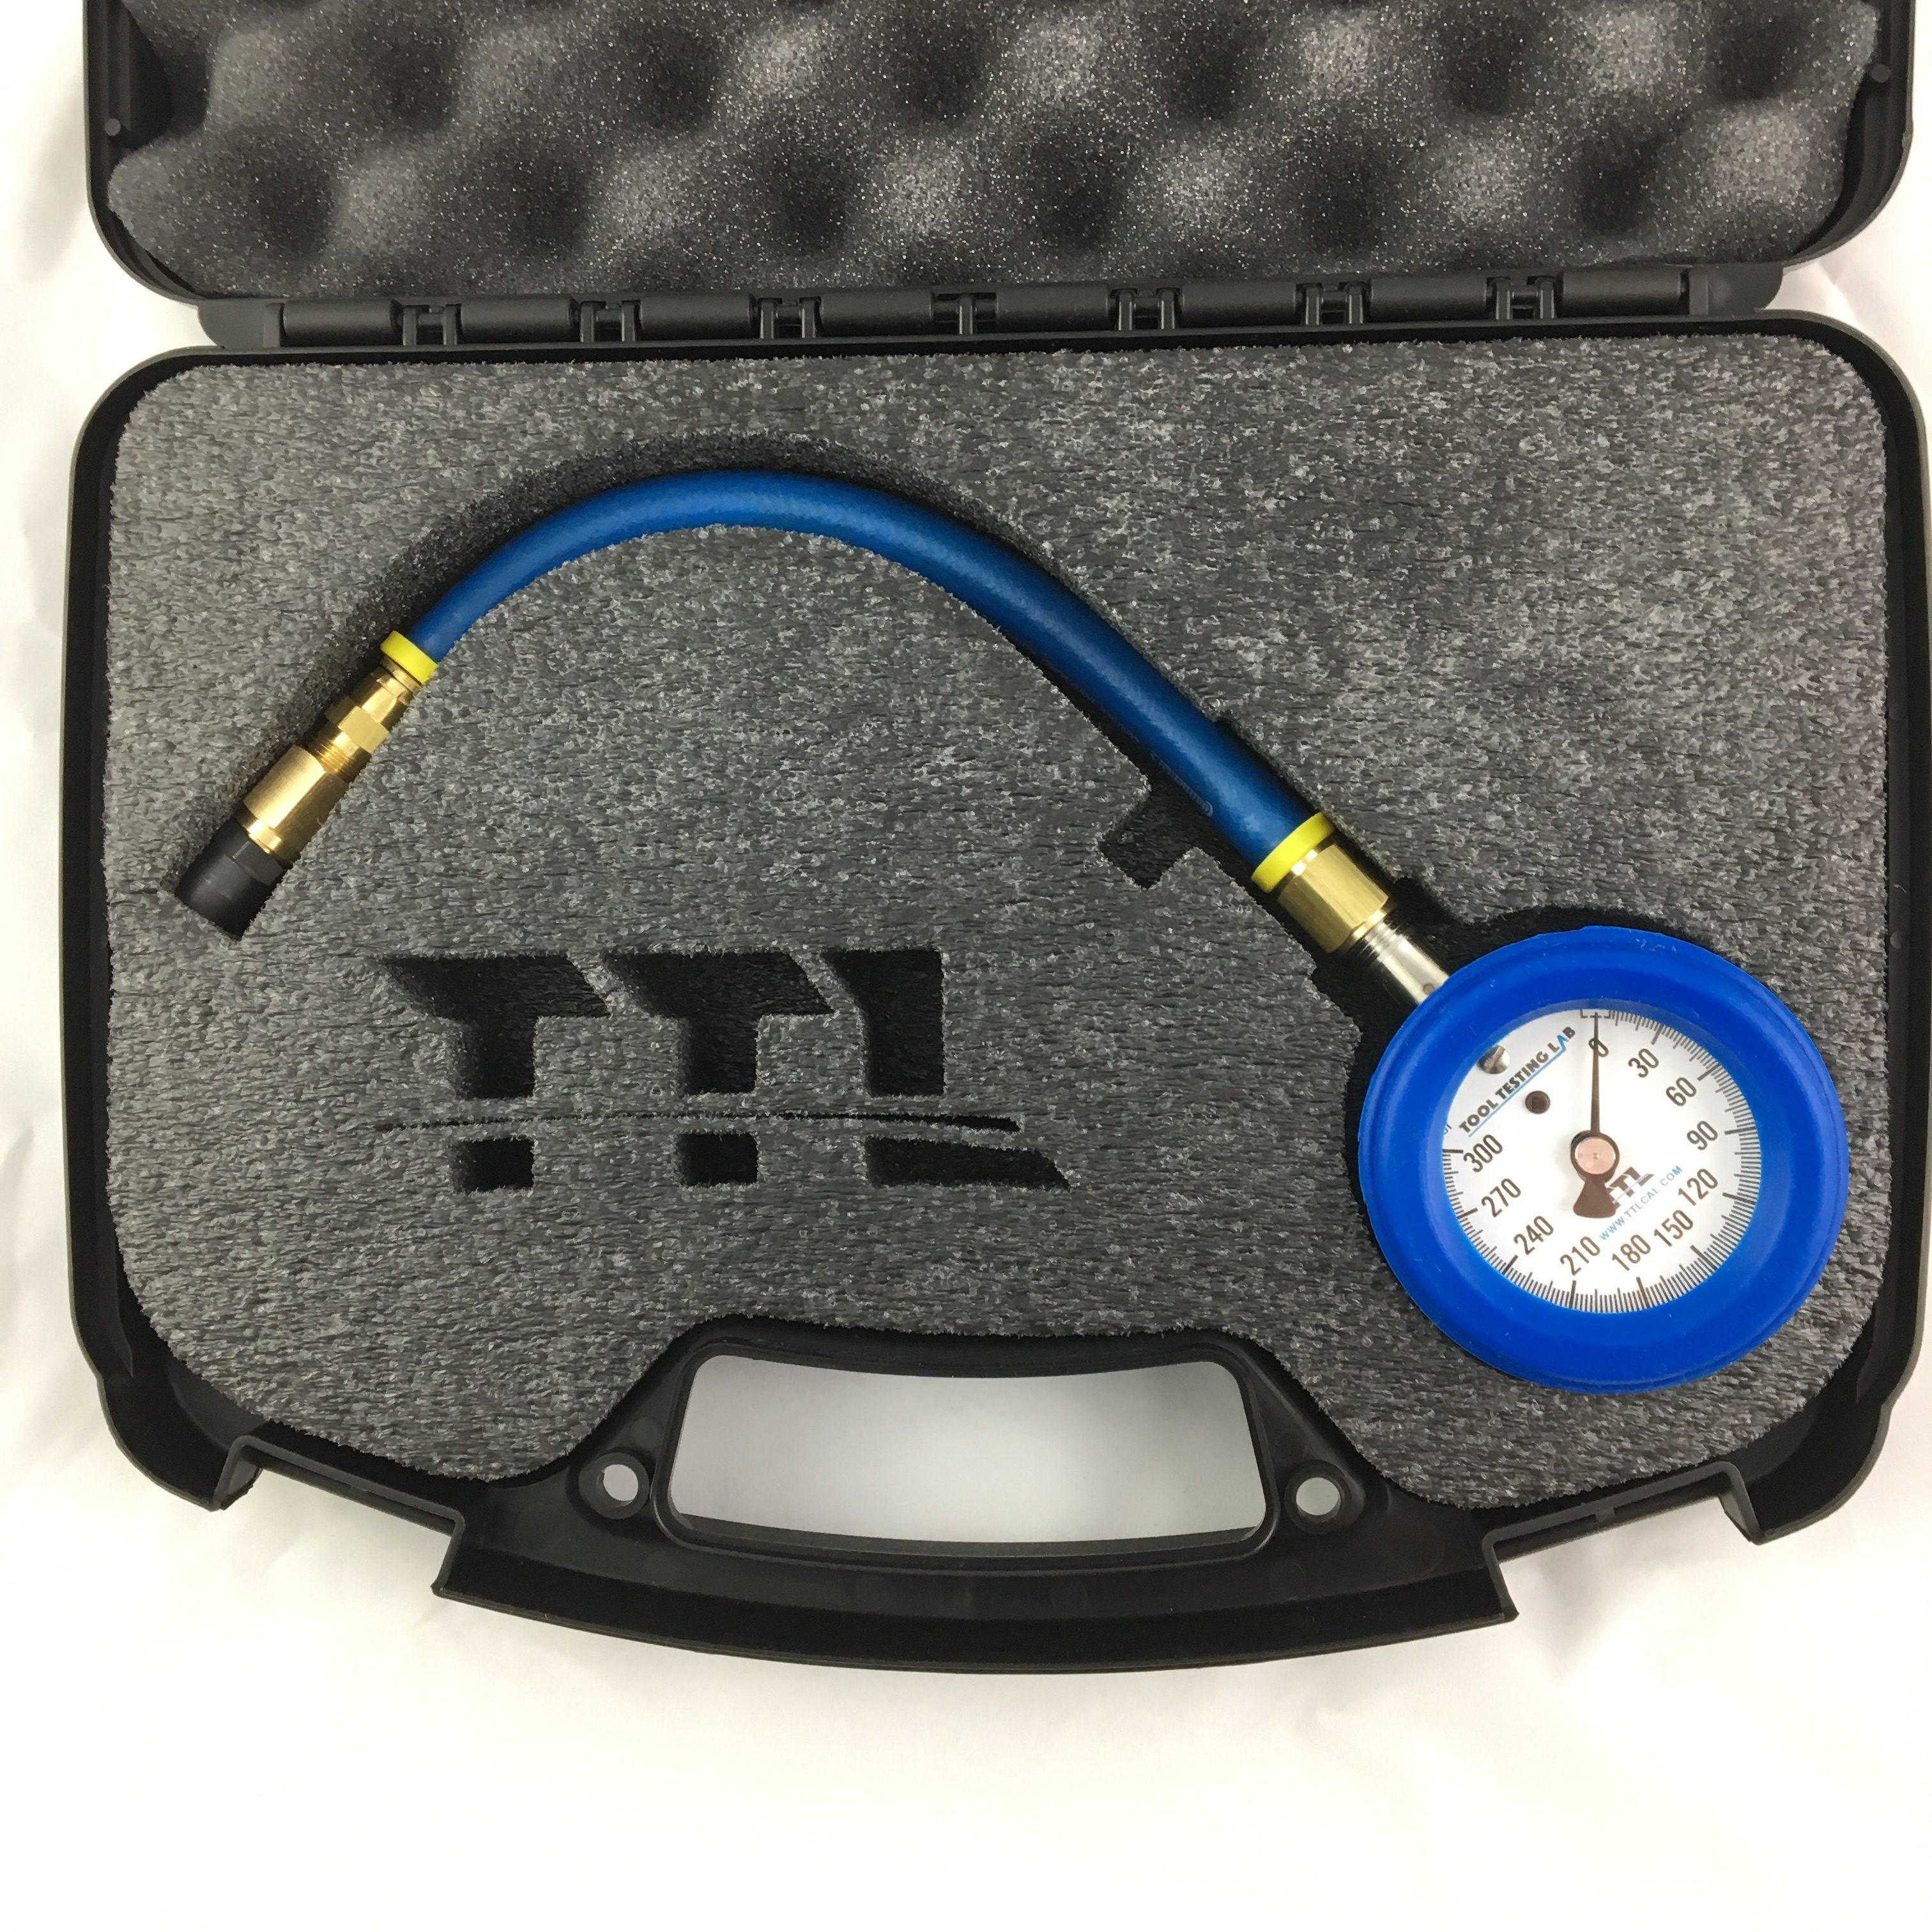 Psi Tire Pressure >> Ttl Analog Aircraft Tire Gauge 0 300 Psi